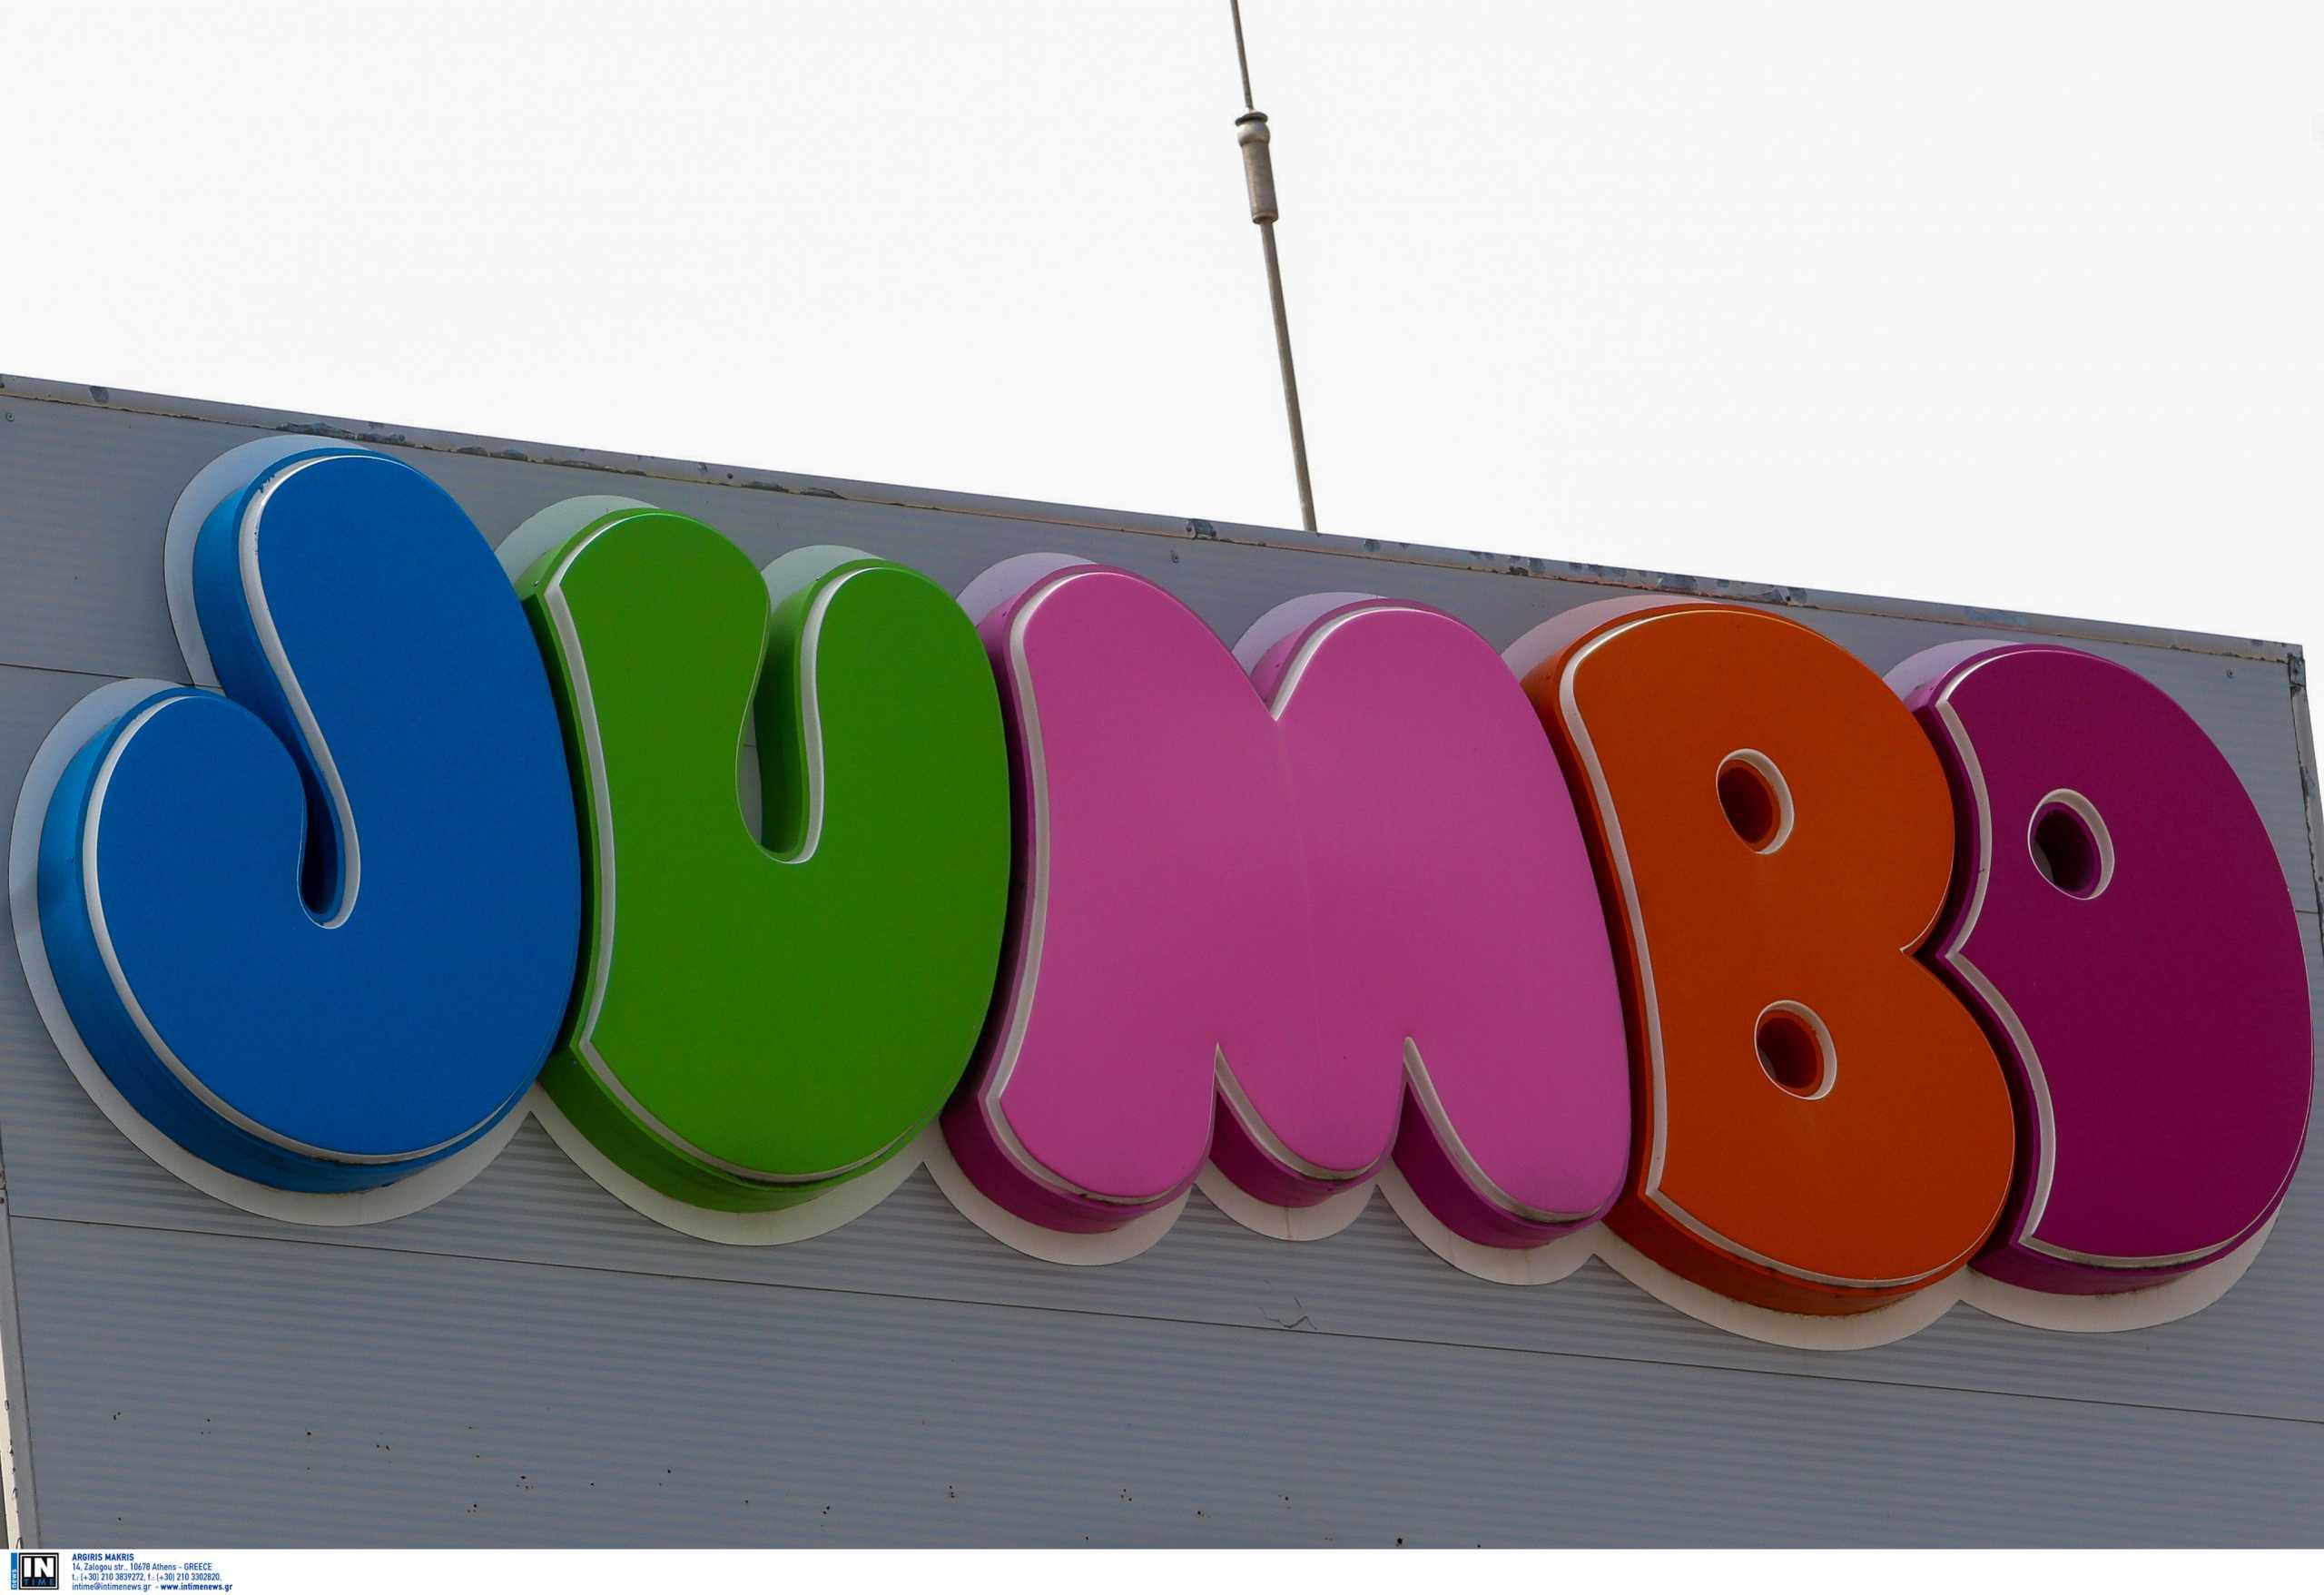 Jumbo: Κλειστά από την Πέμπτη τα καταστήματα της εταιρείας σε Αττική, Πάτρα και Χαλκίδα